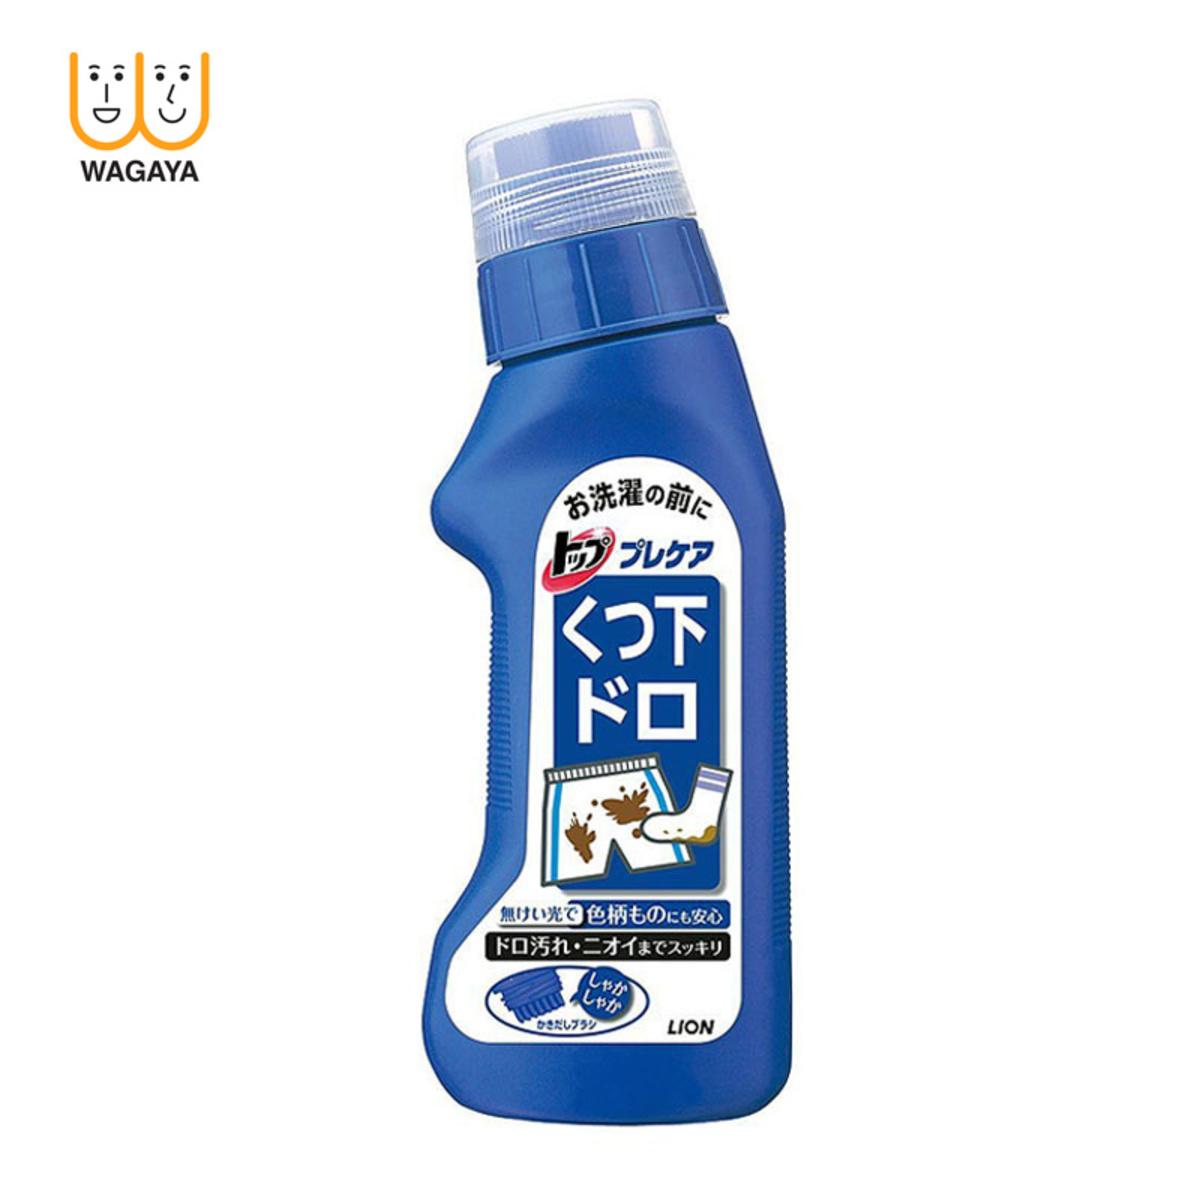 TOP Precare (Mud Stains - Blue) 220ml